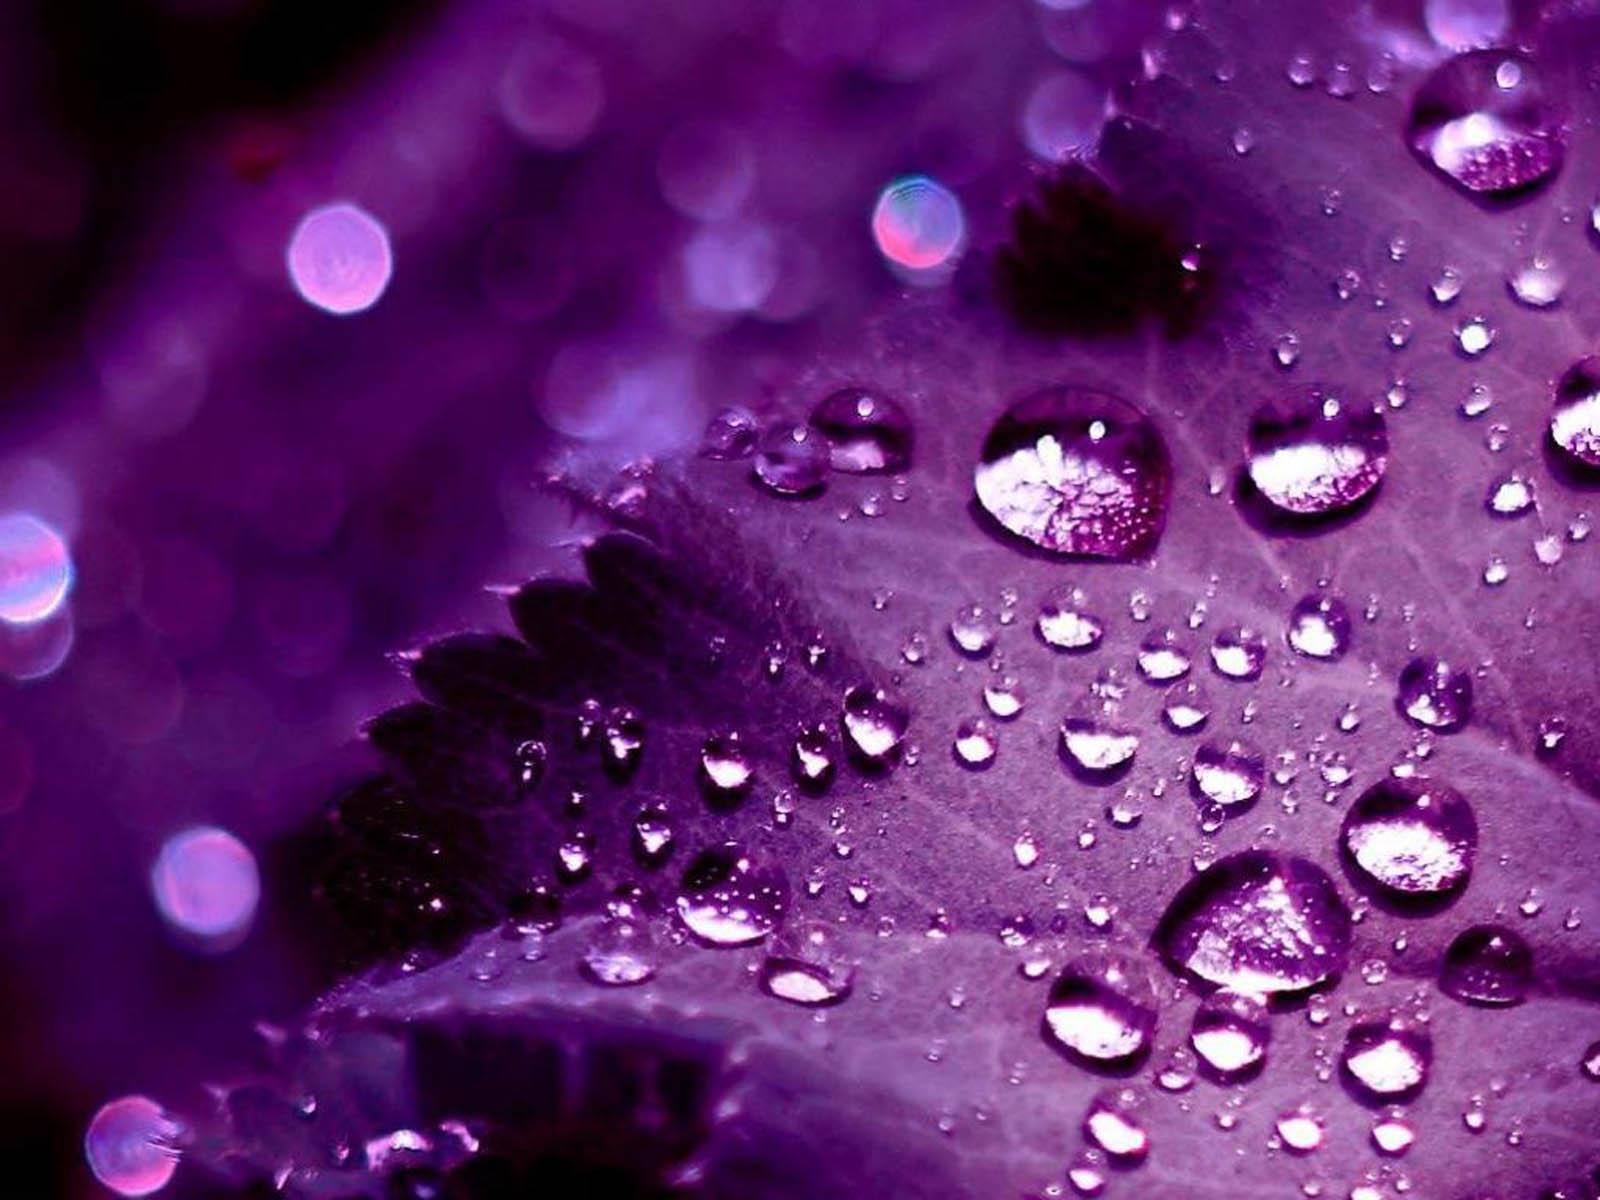 Pretty Purple Desktop Backgrounds wallpaper wallpaper 1600x1200